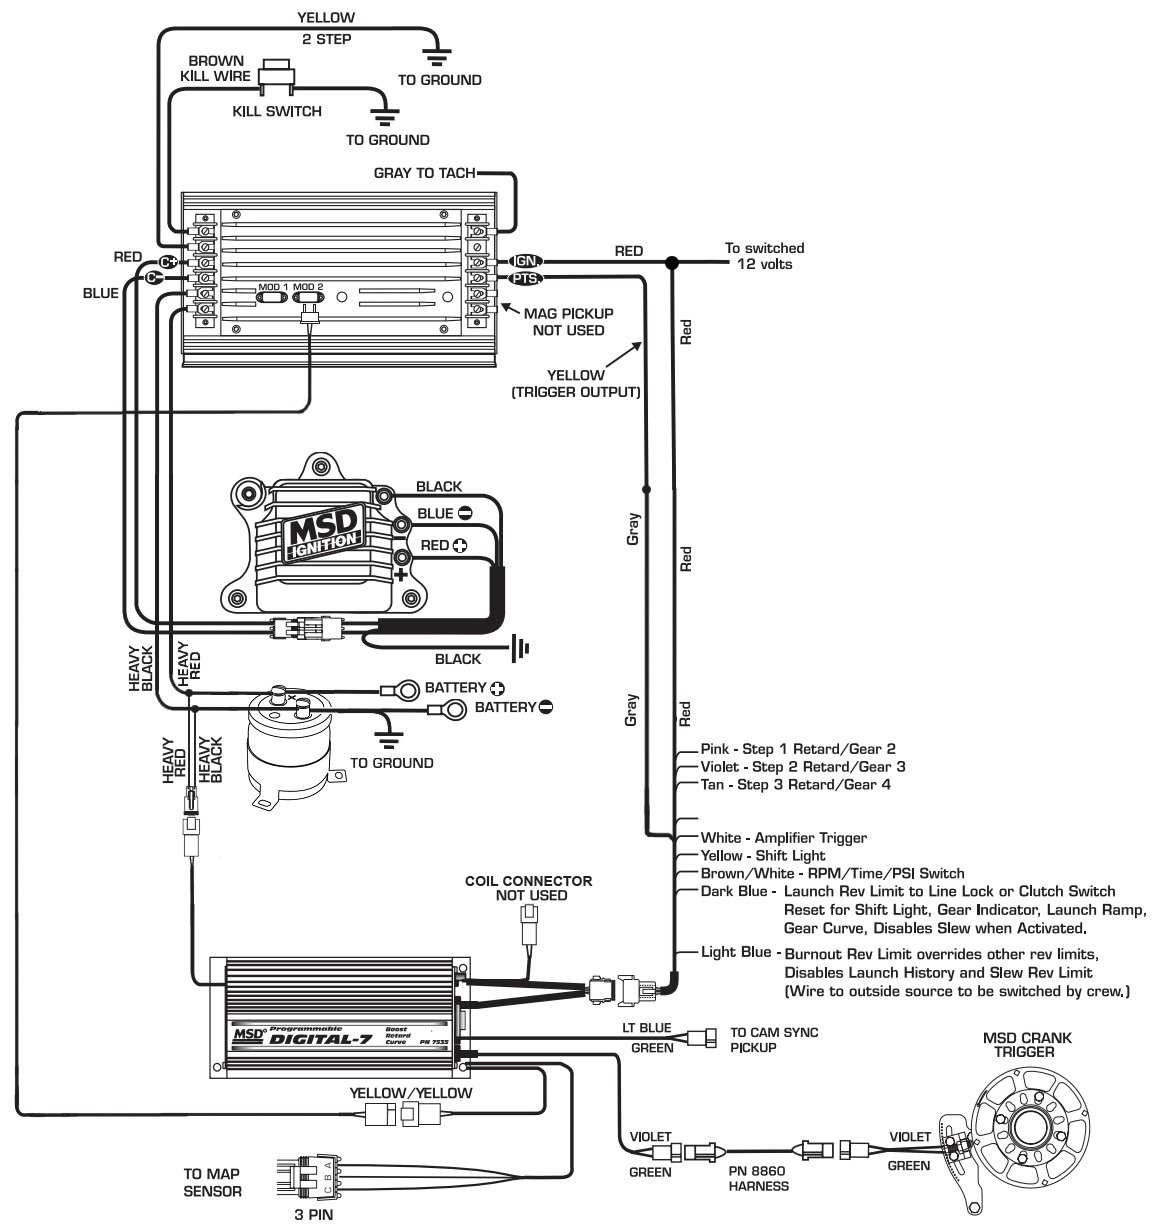 tel tac 2 wiring diagram diy wiring diagrams u2022 rh dancesalsa co Mallory Unilite Ignition Wiring Diagram Magneto Tel Tac Wiring-Diagram